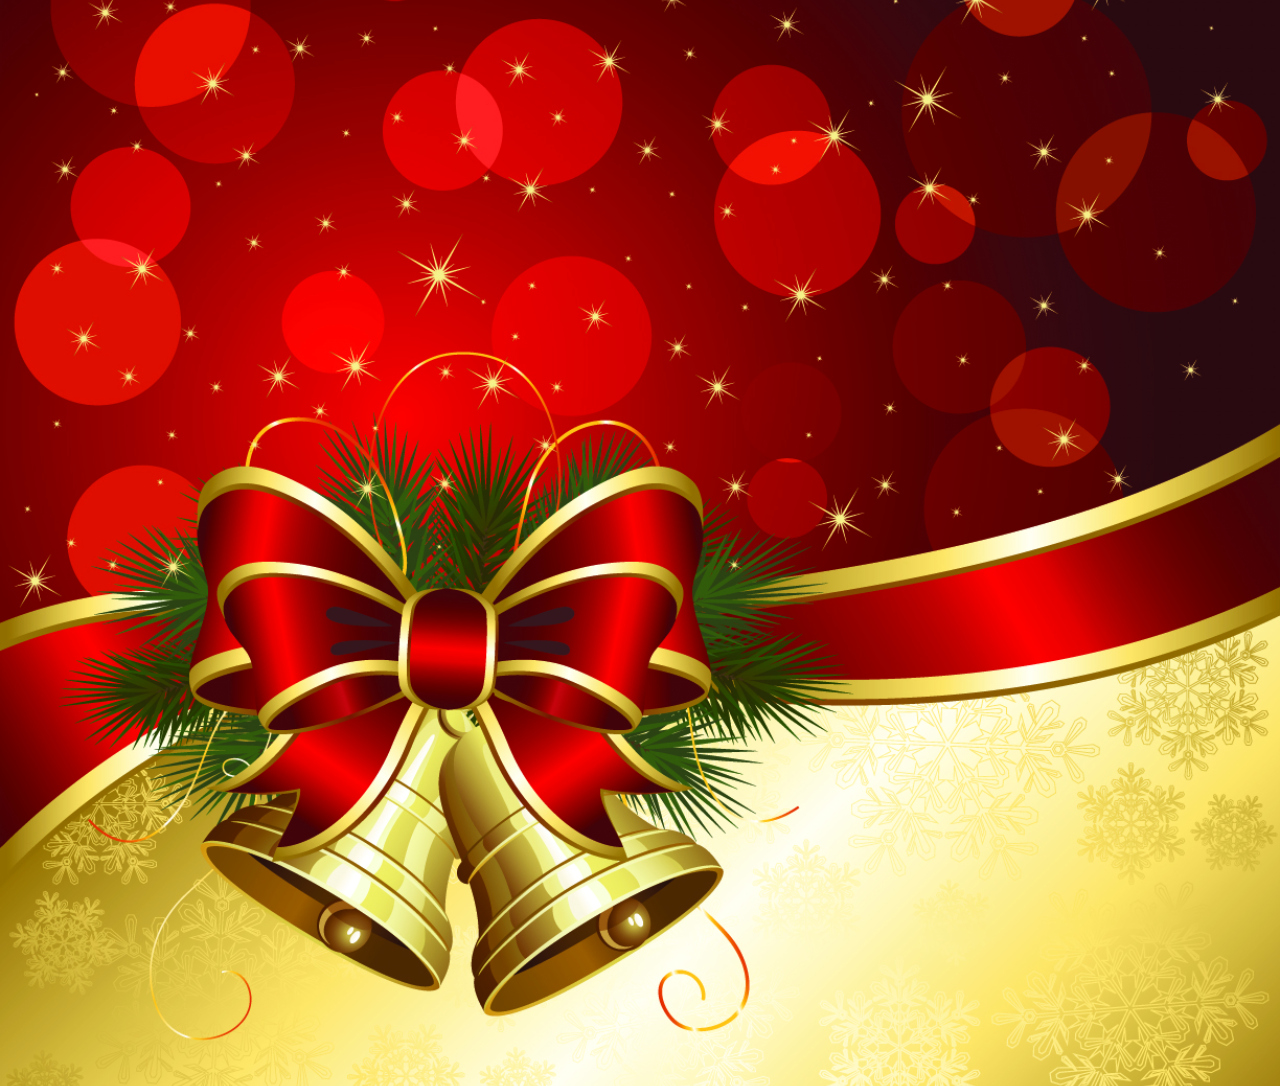 Merry Christmas - Chri...